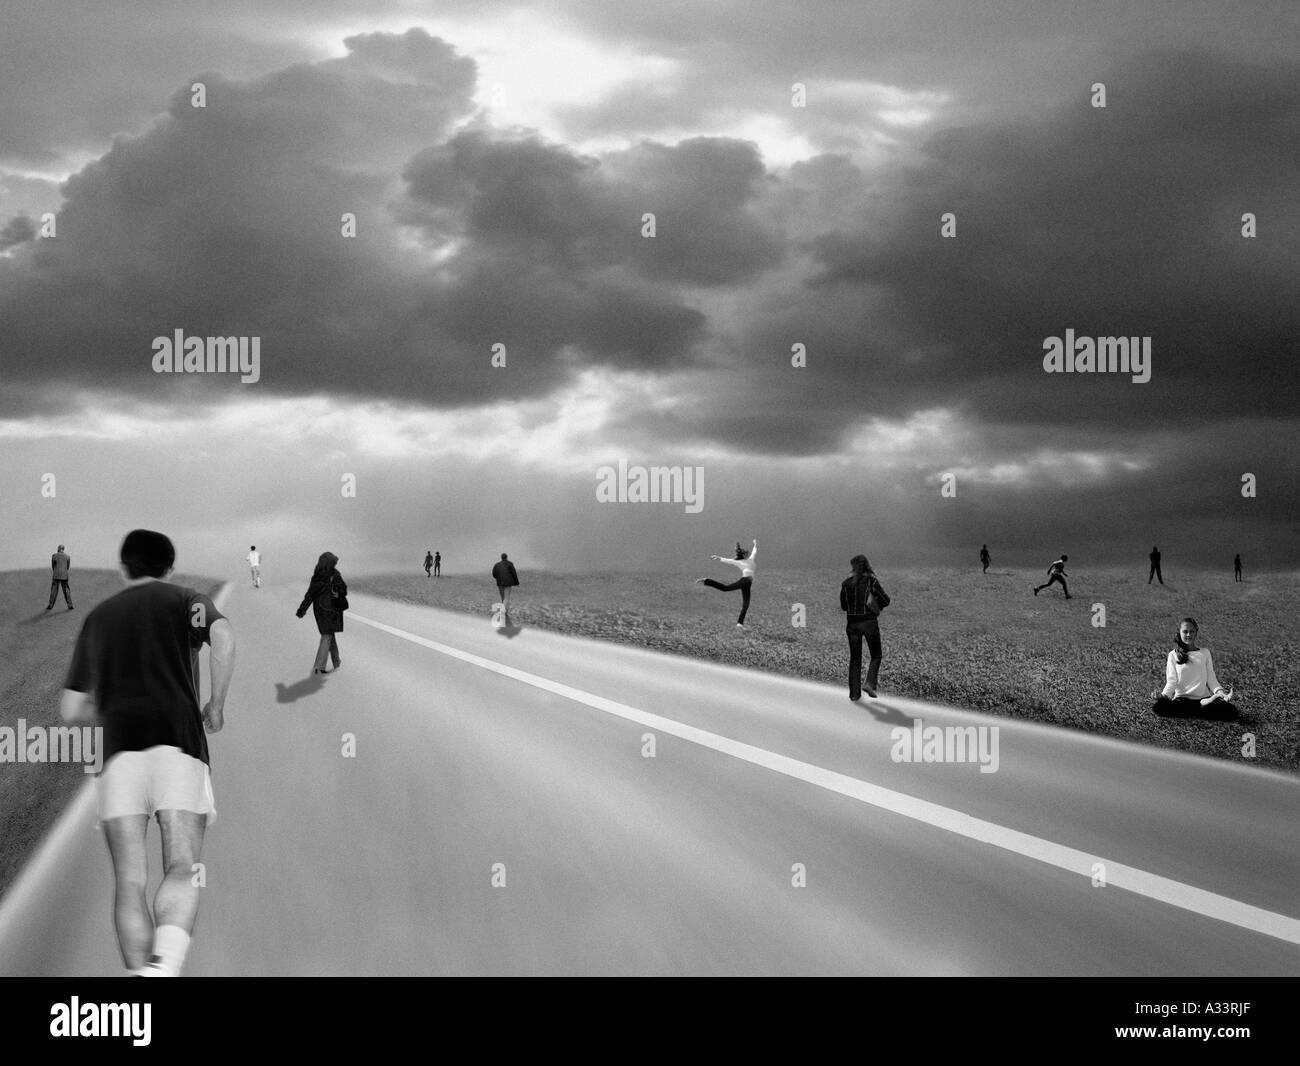 People varied activities BD7 - Stock Image